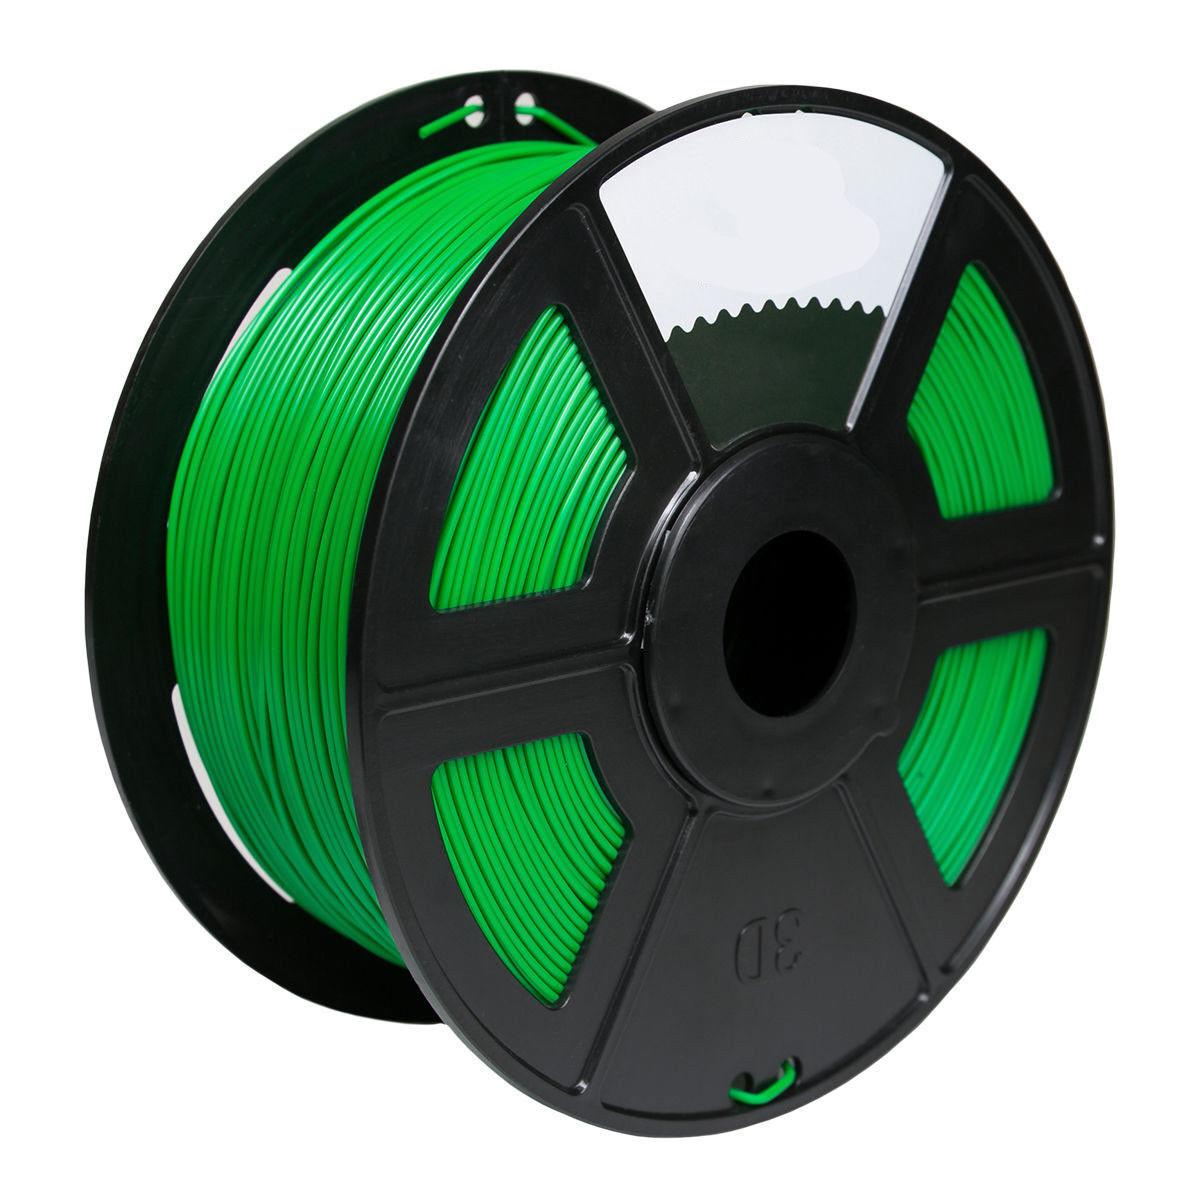 Green Color 3D Printer Filament 1.75mm 1KG ABS For Print MakerBot RepRap